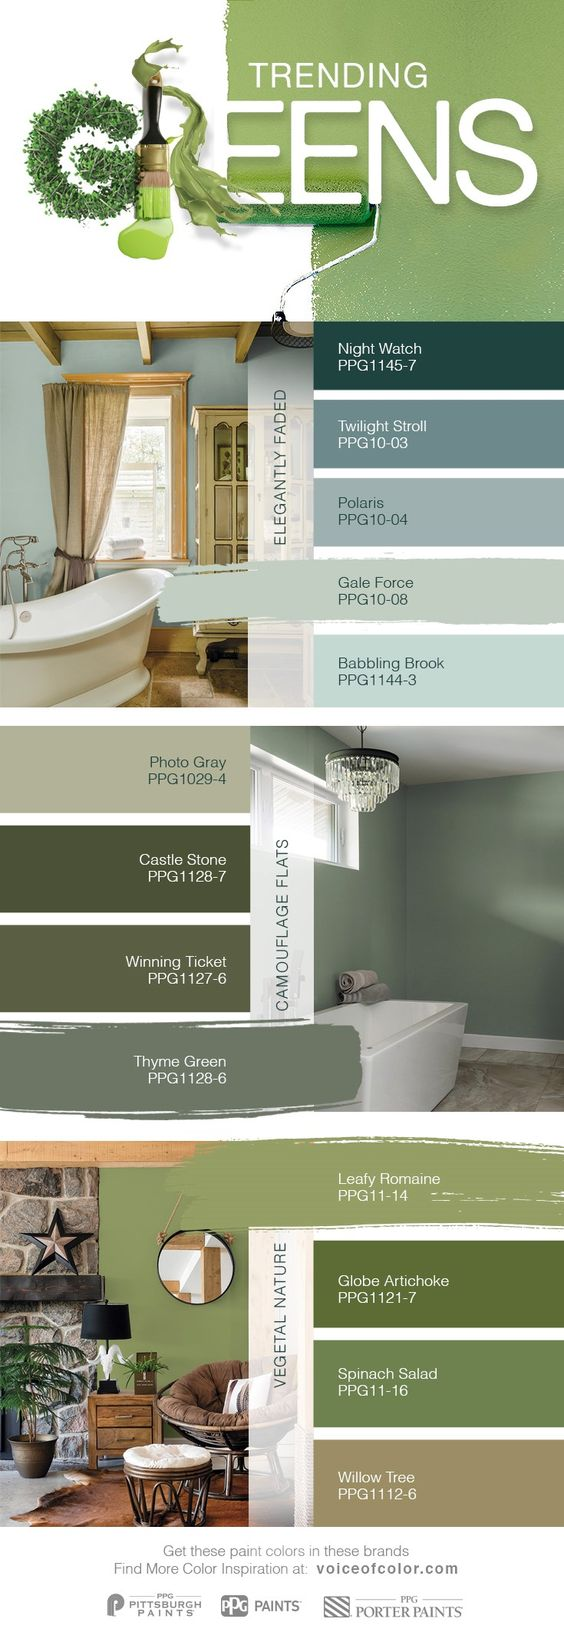 Interior Design Ideas - Interiors By Color